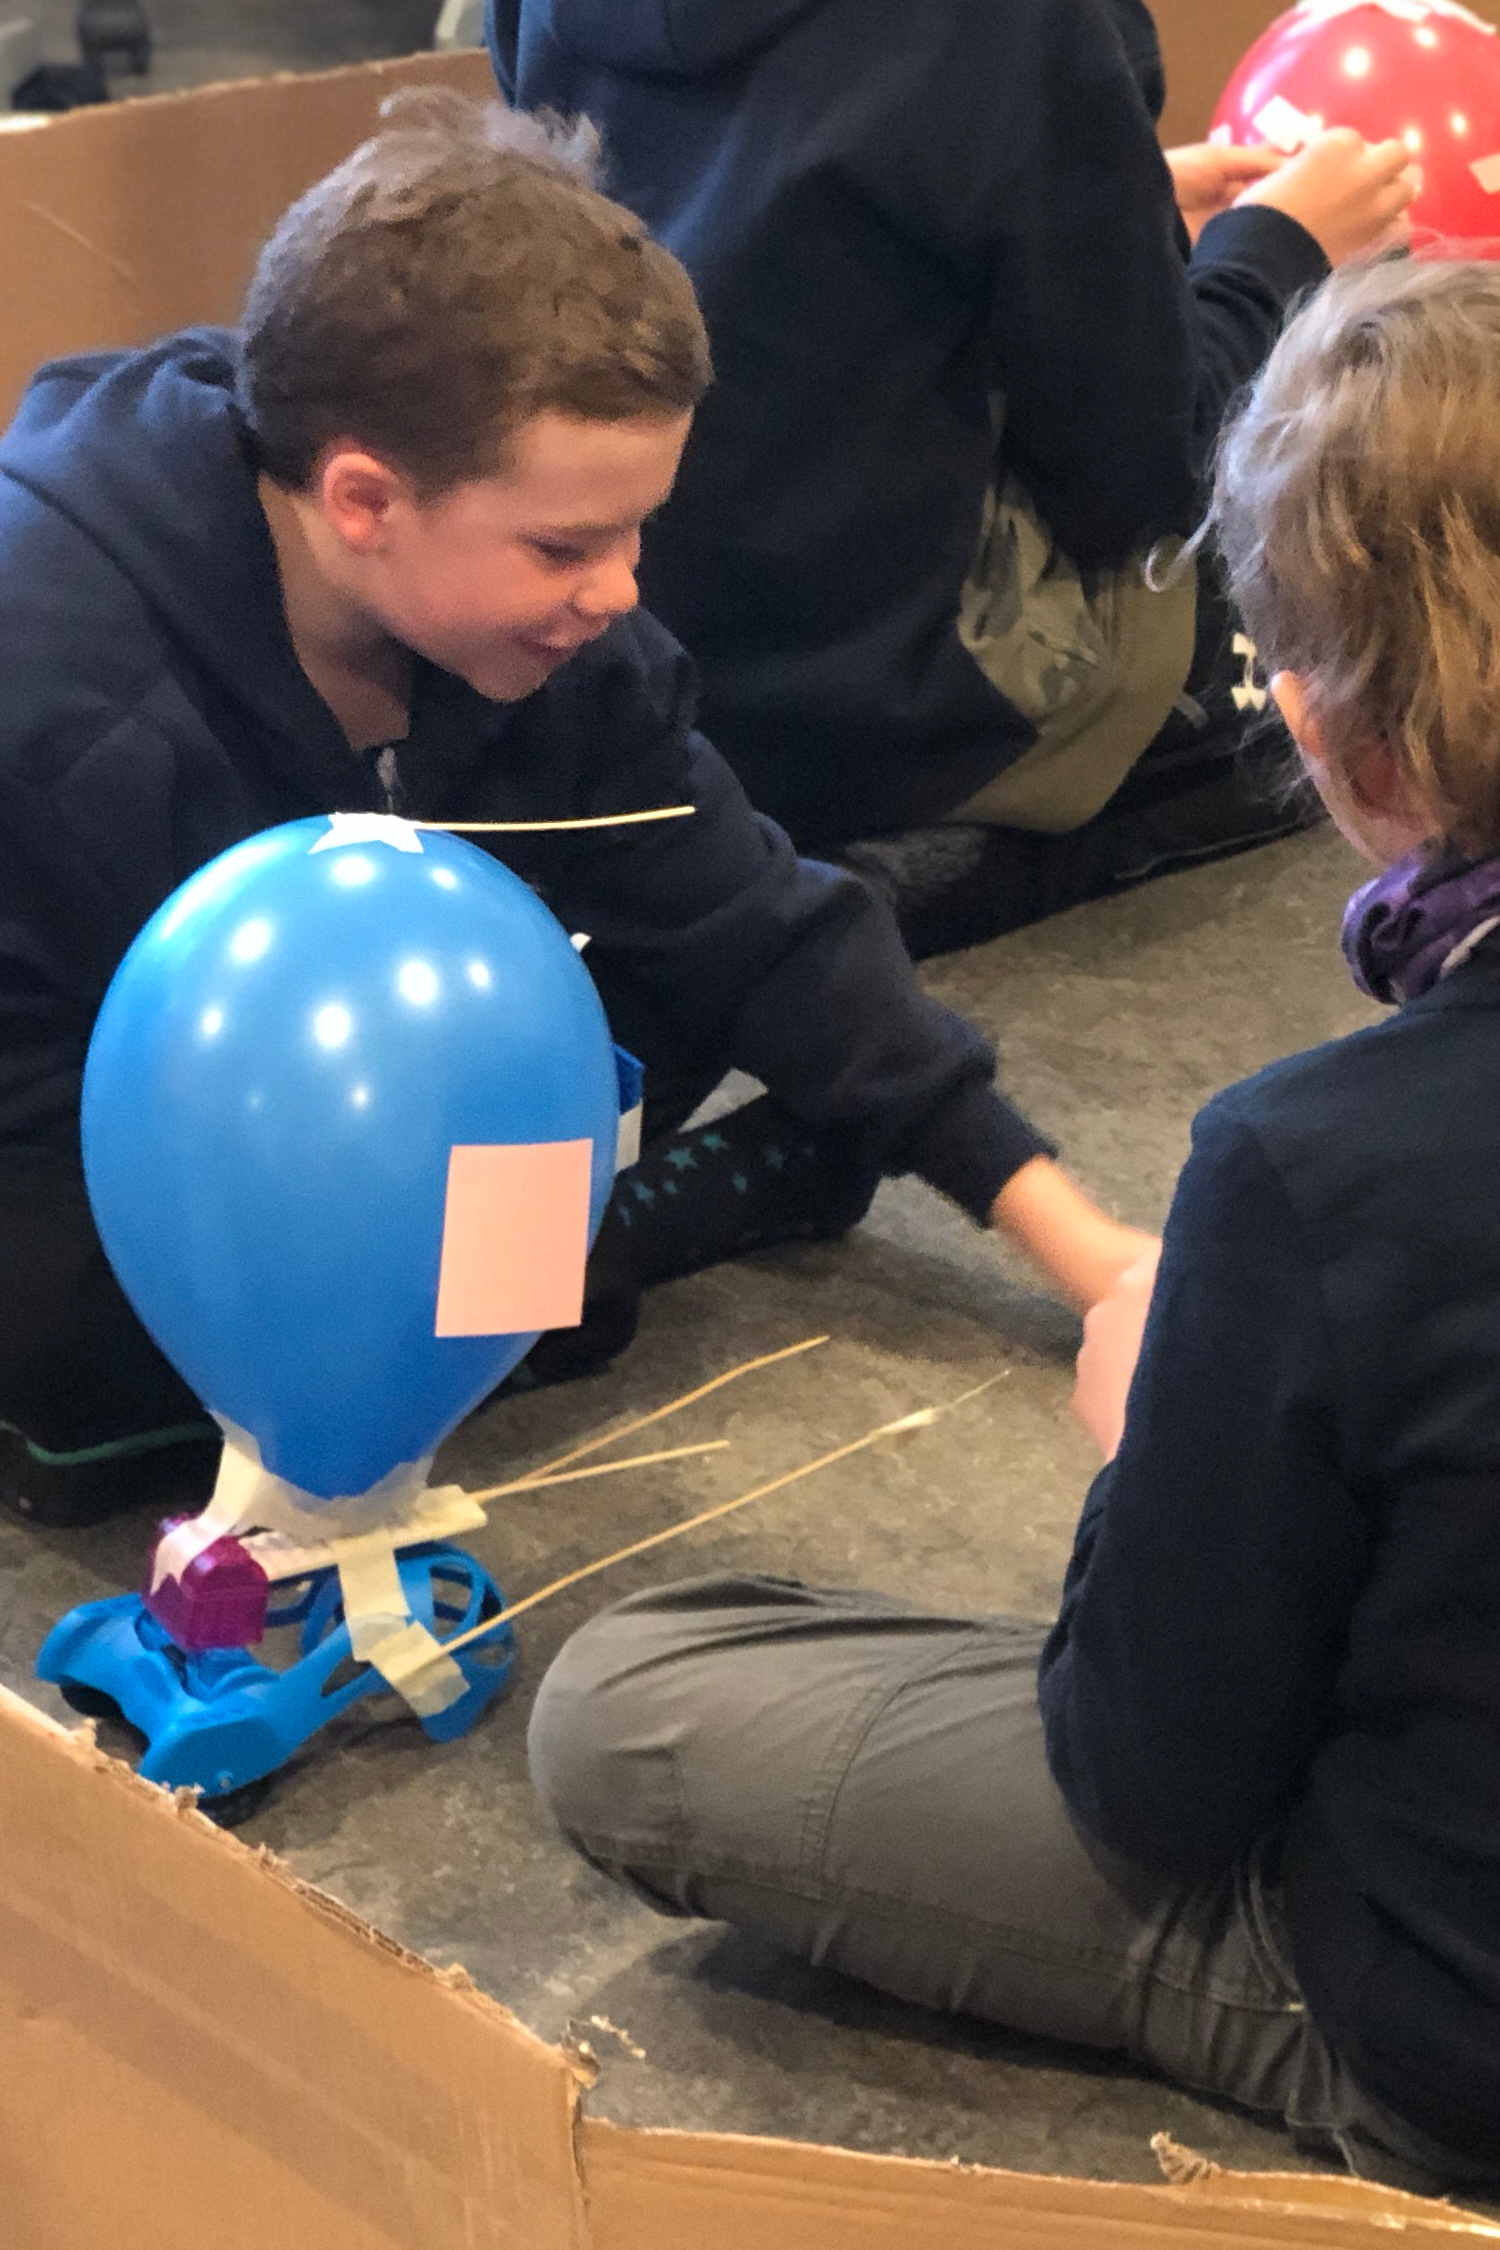 Teens Modifying BattleBots